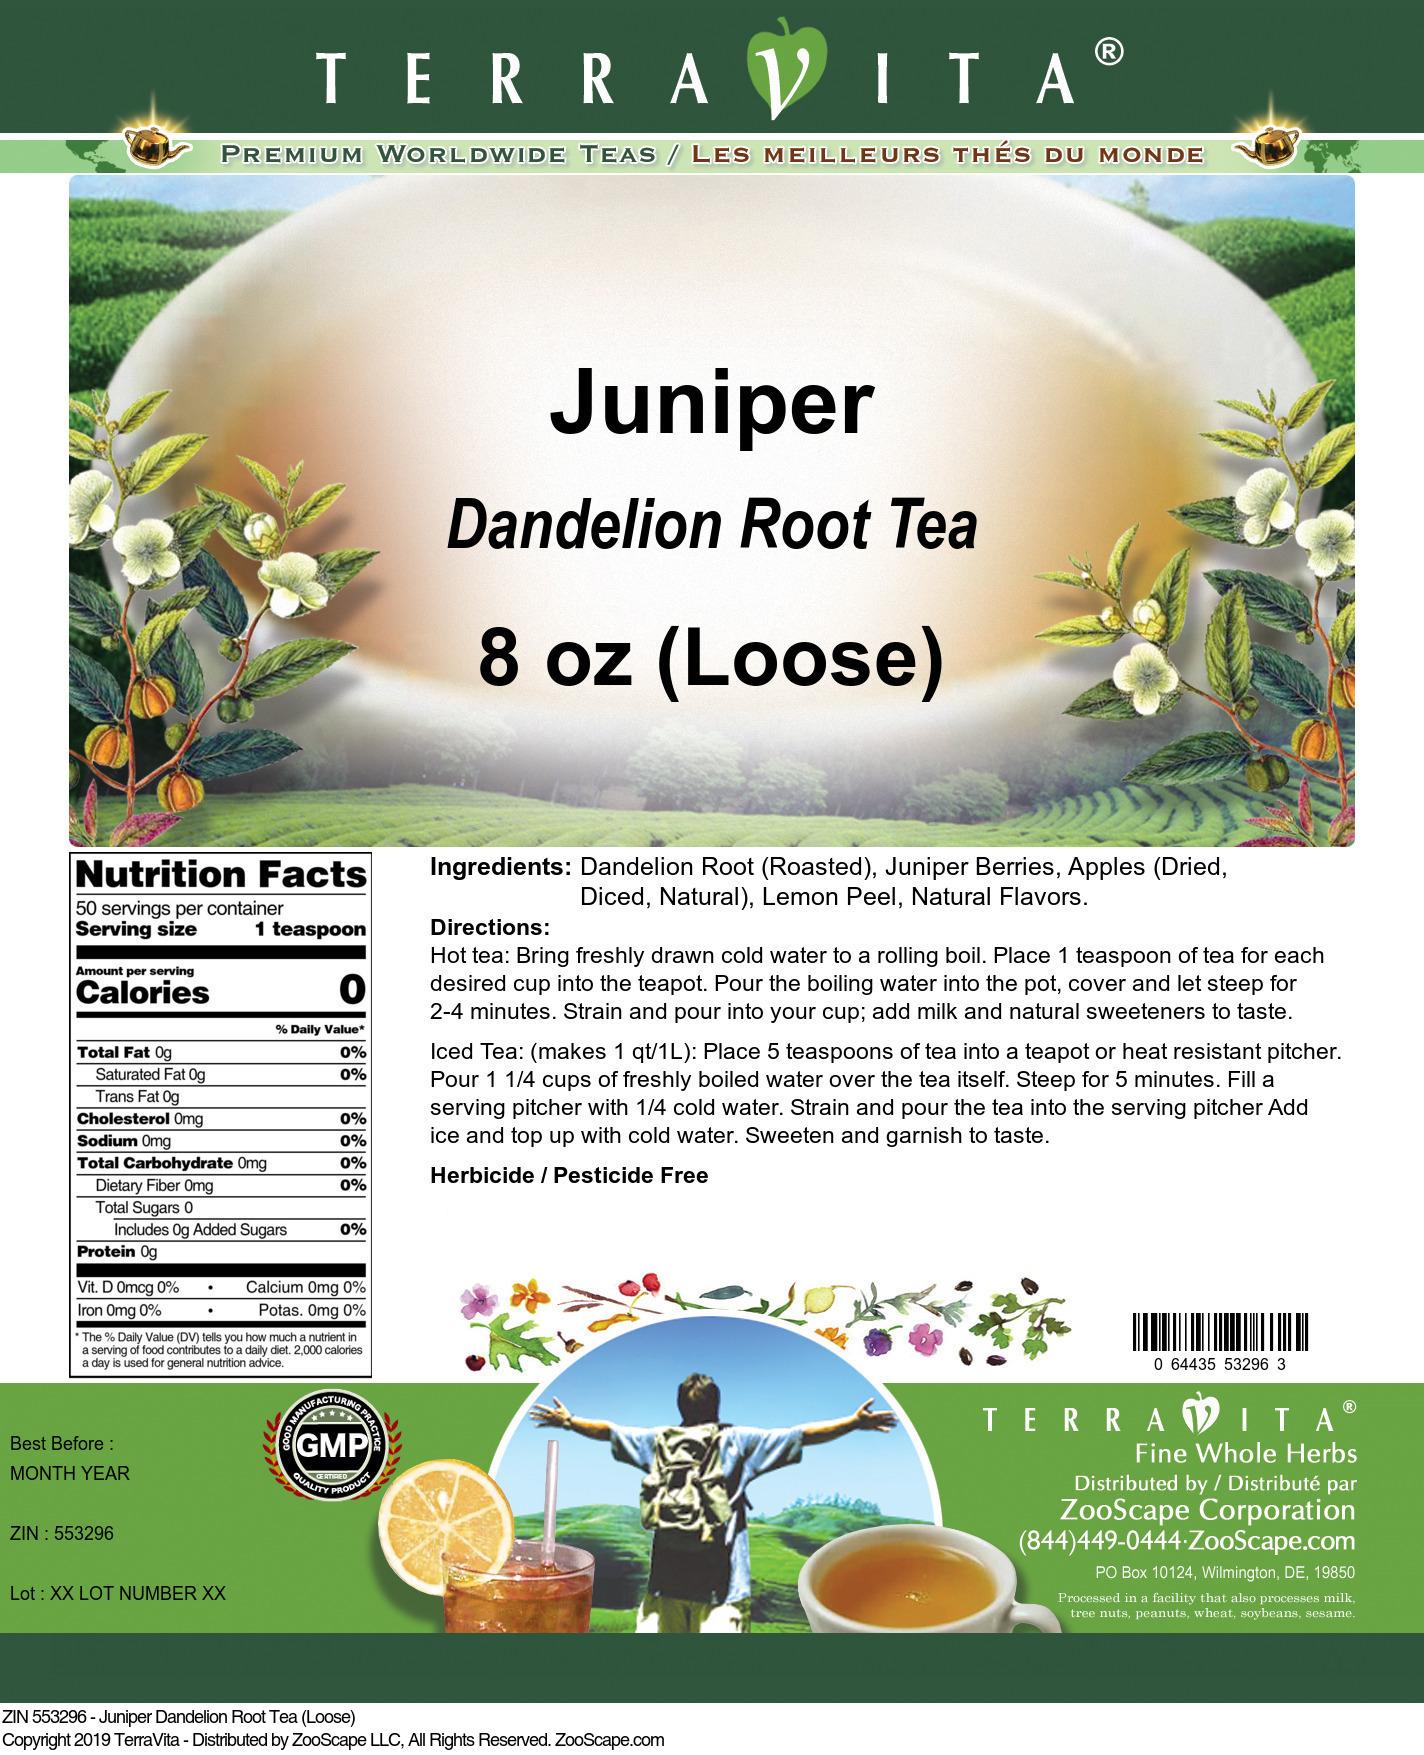 Juniper Dandelion Root Tea (Loose)